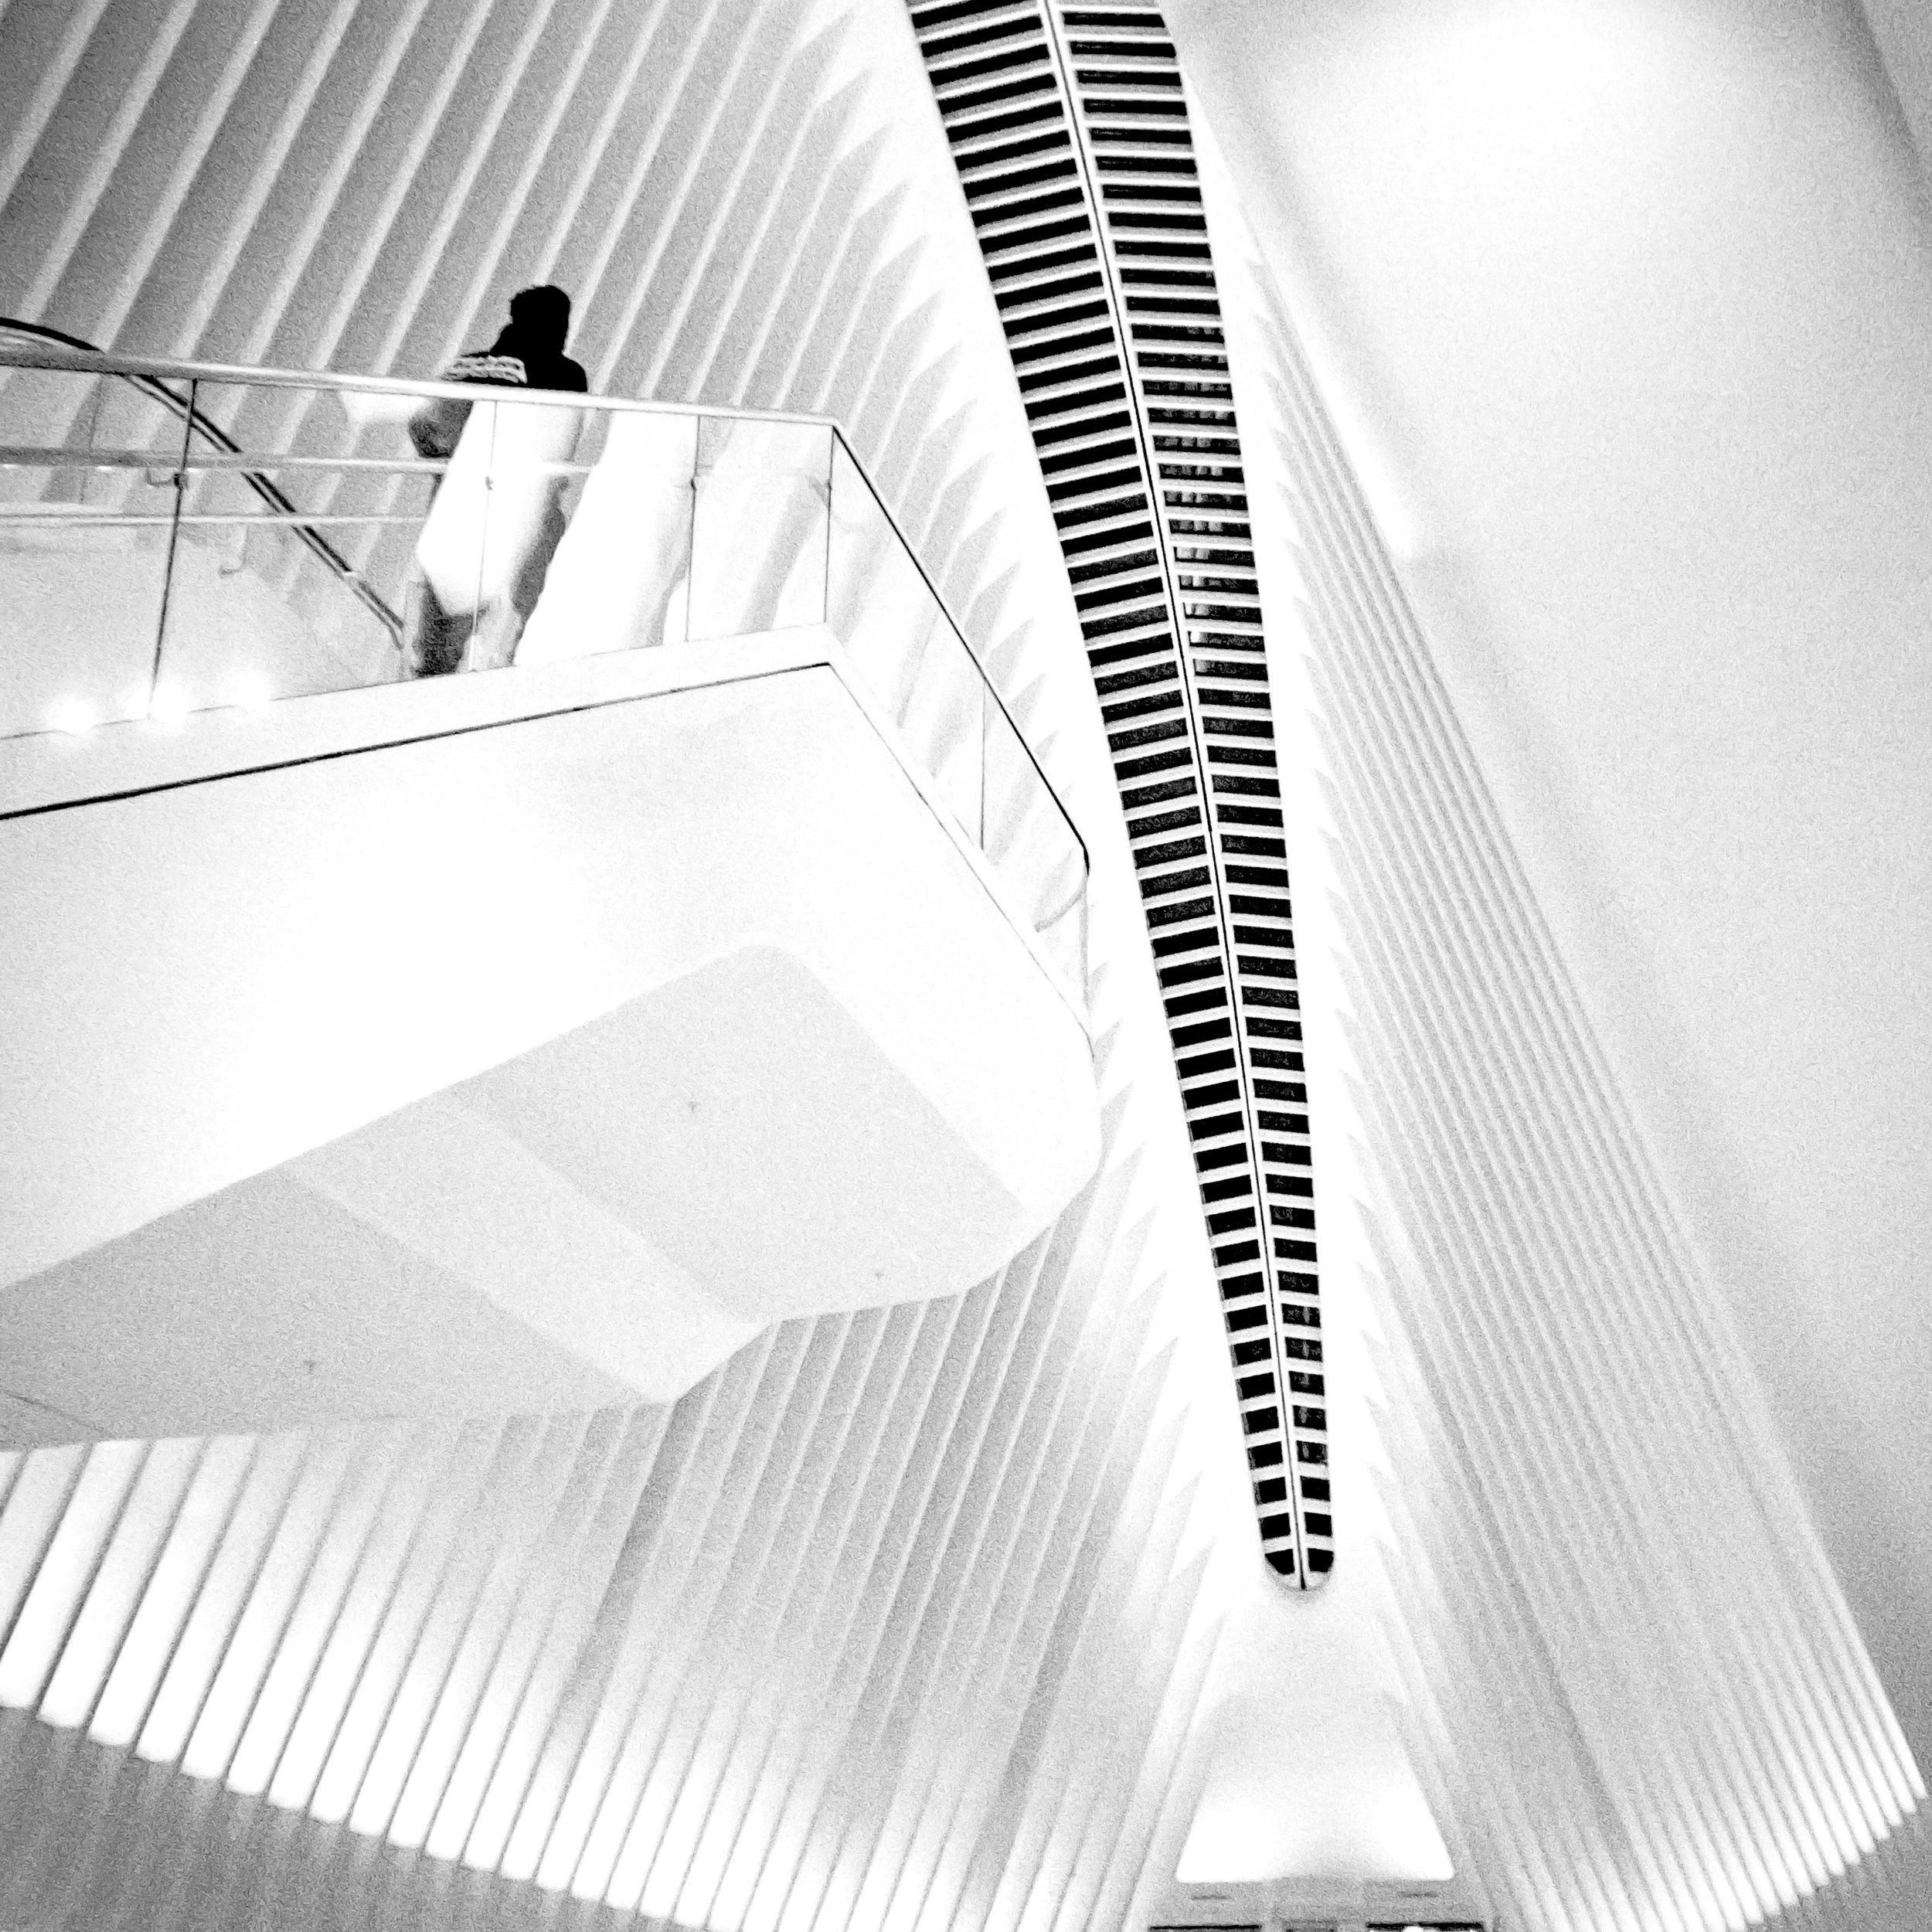 Inside the Oculus, New York